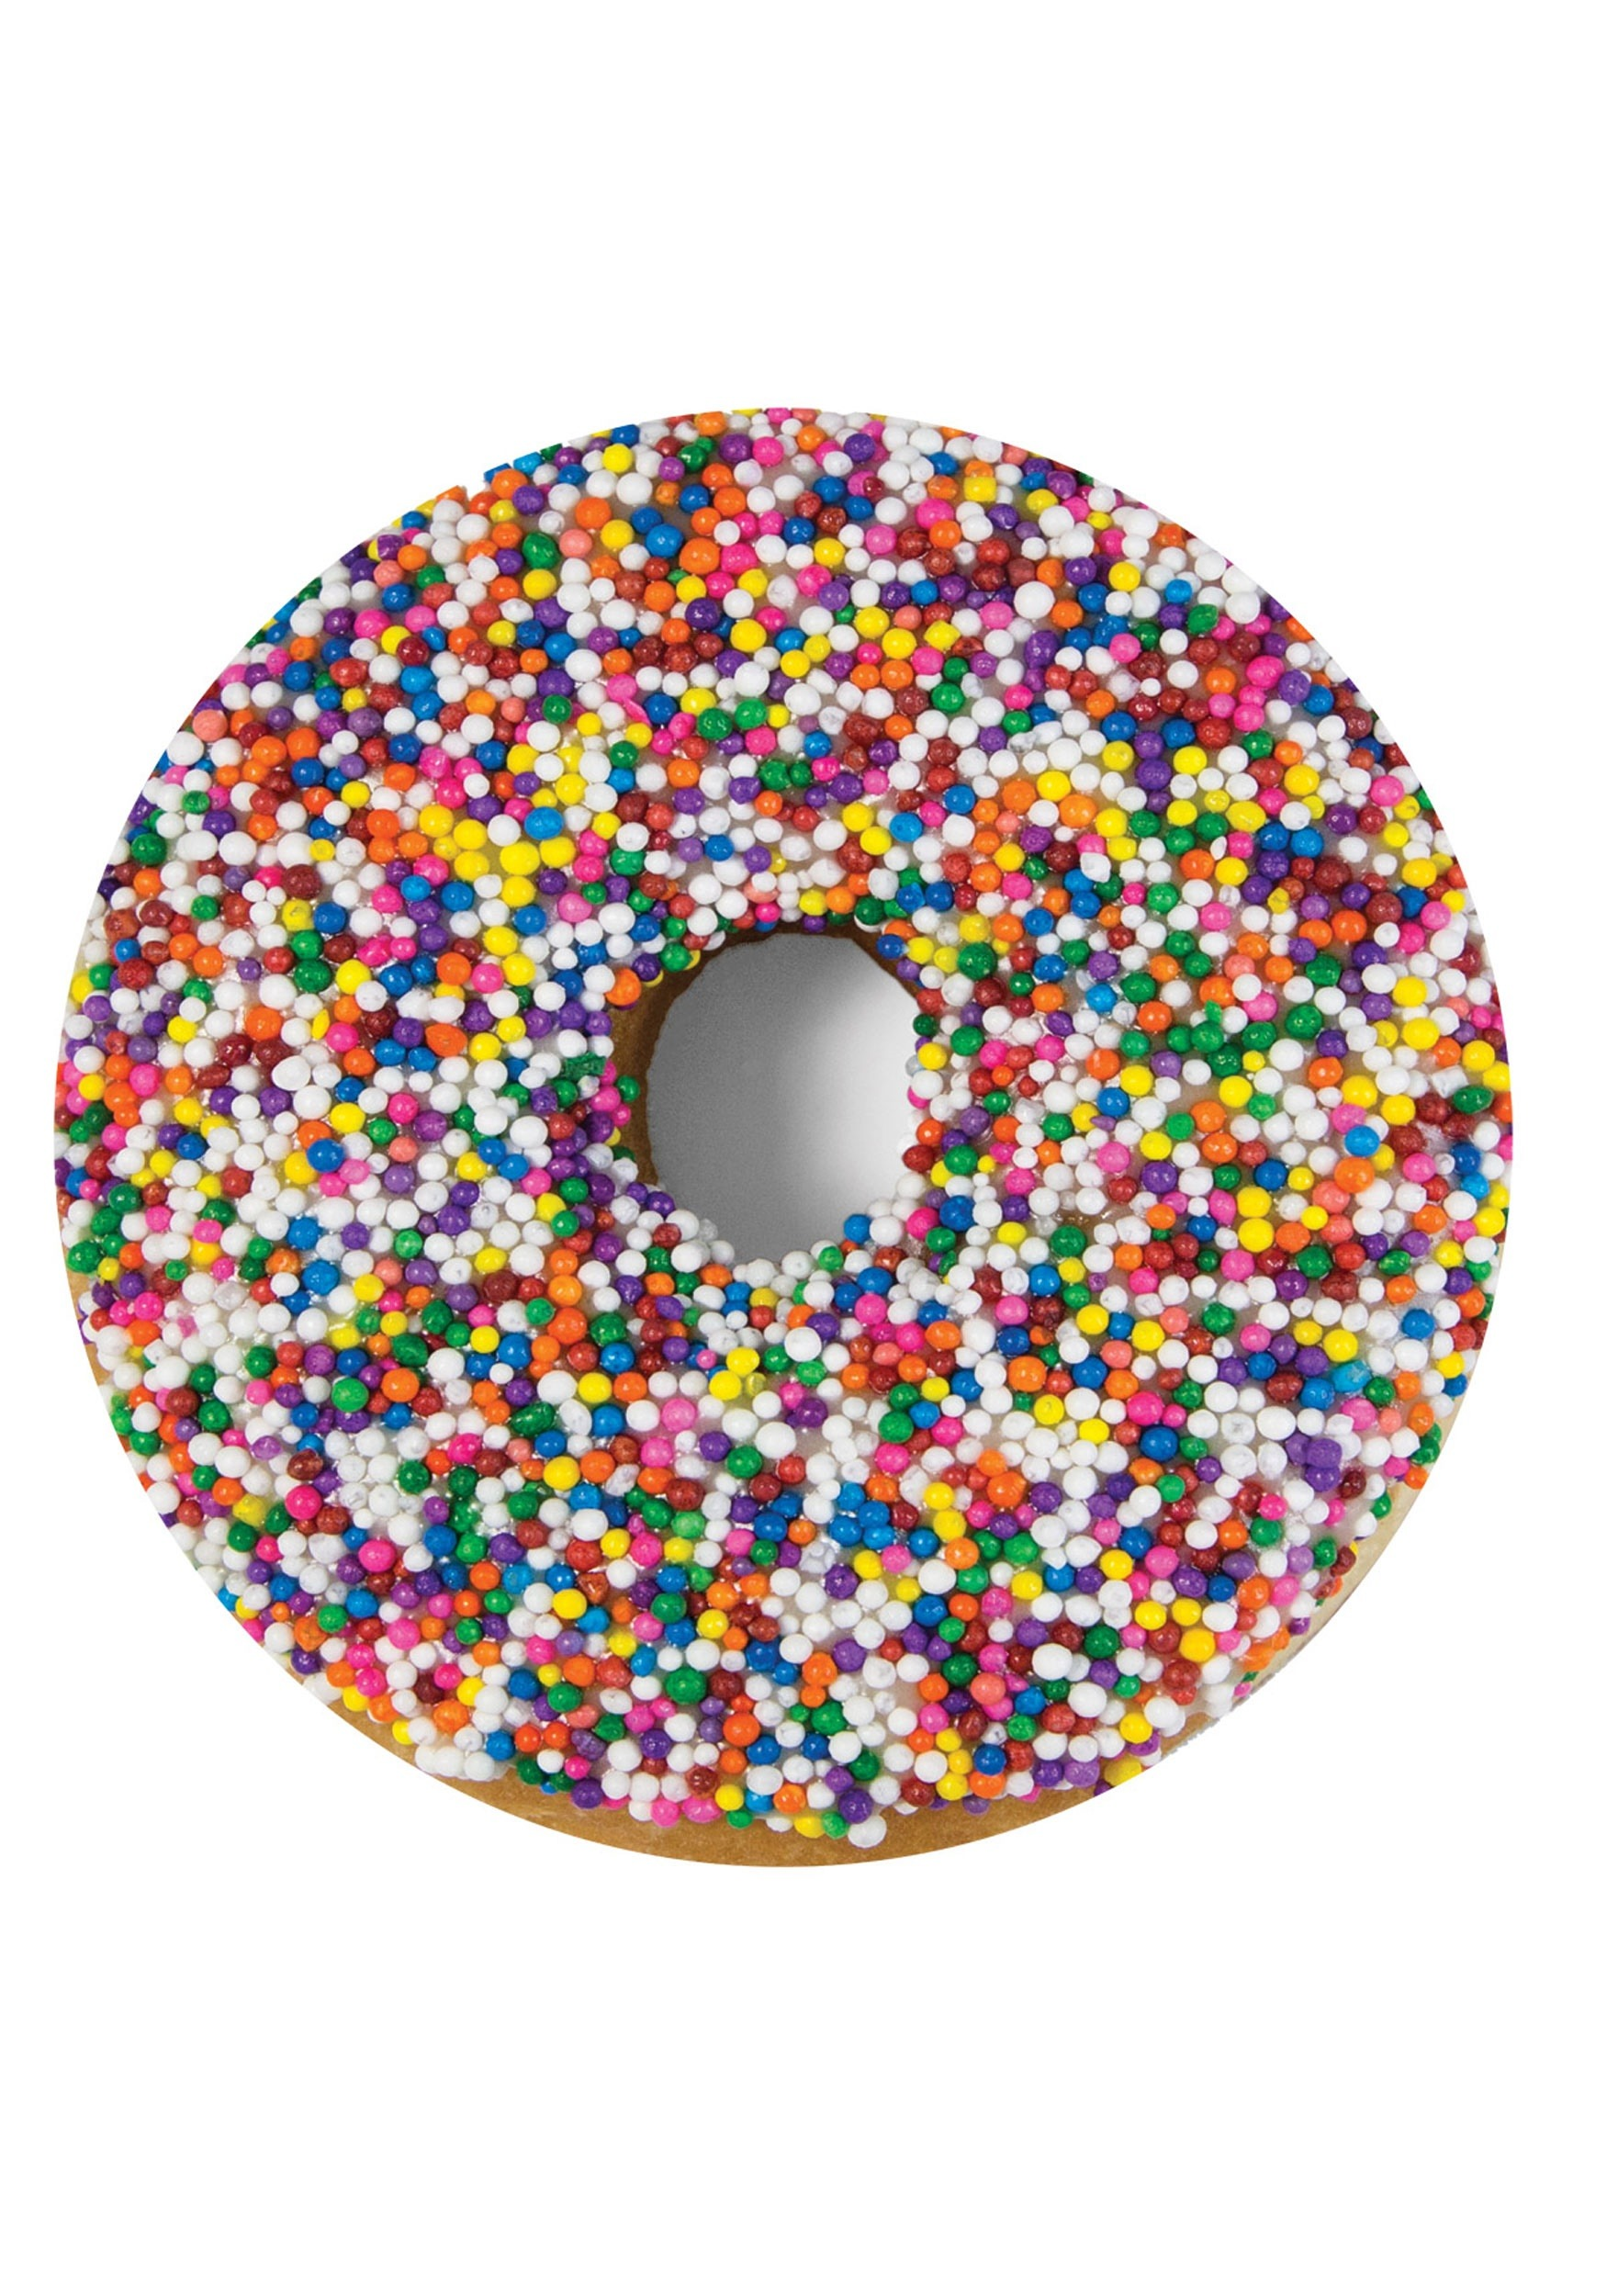 60 Inch Diameter Donut Blanket Photo Realistic